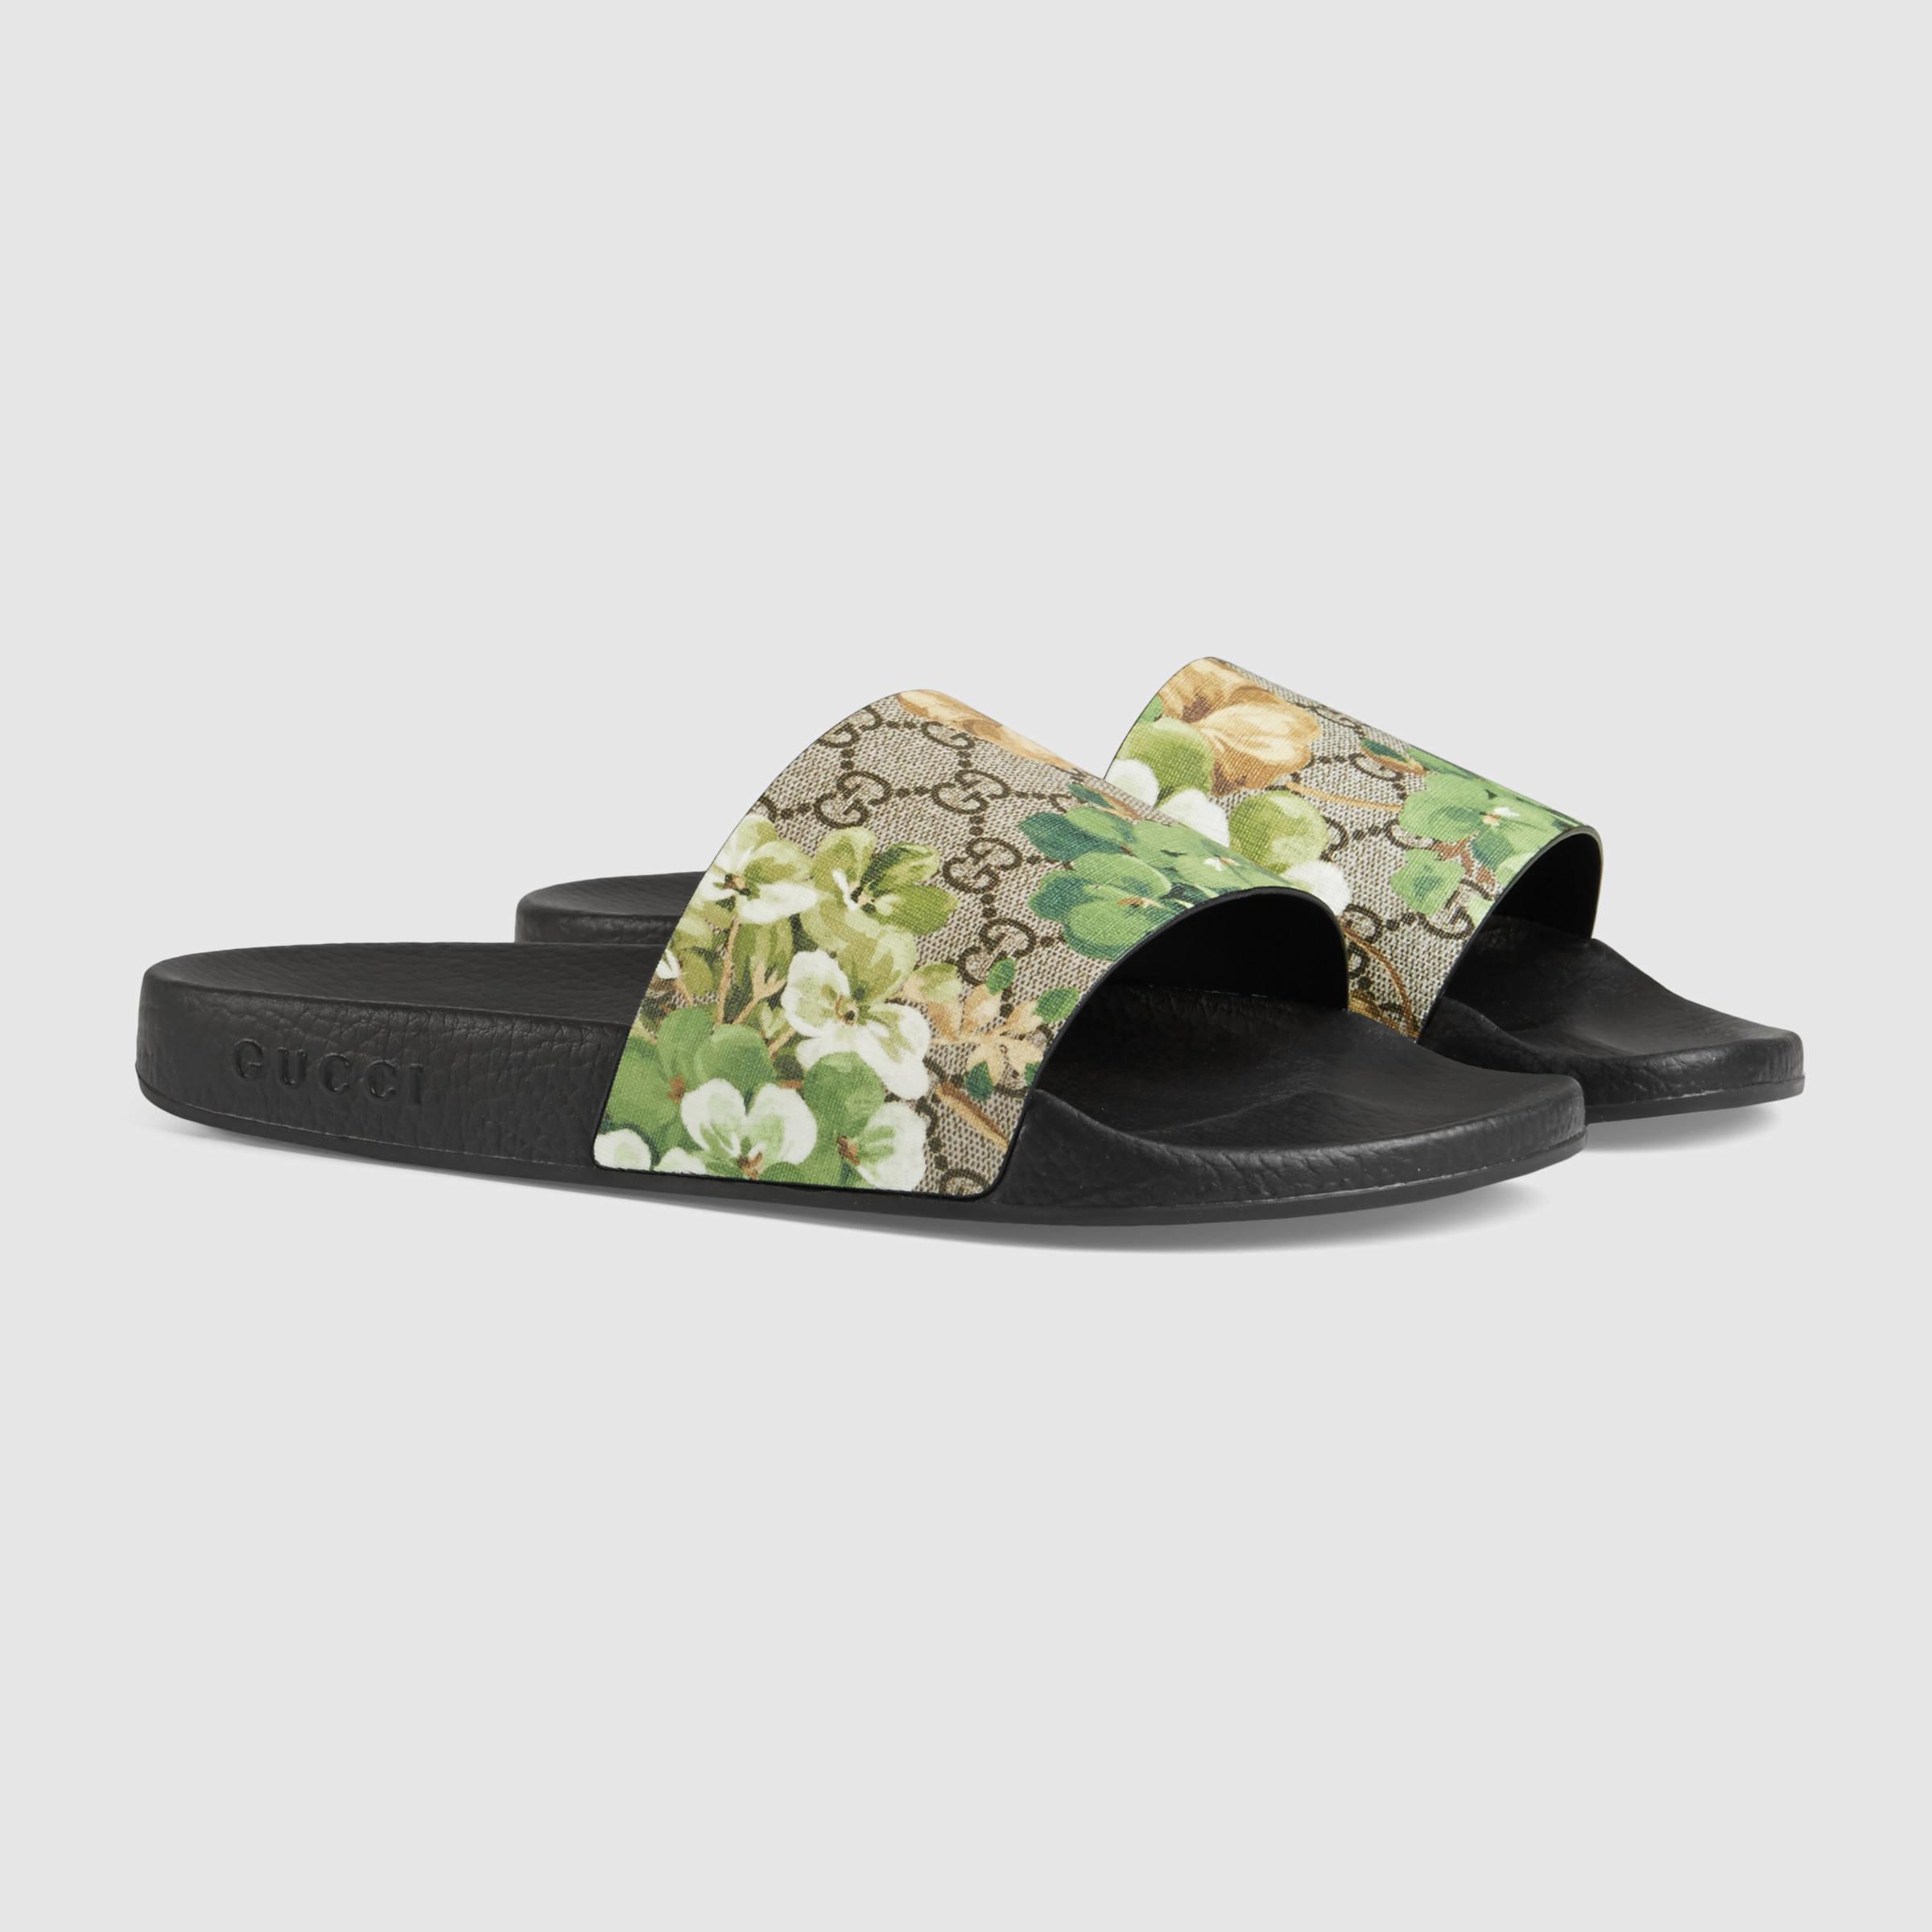 3079ae40cd5 Lyst - Gucci Blooms Print Sandal